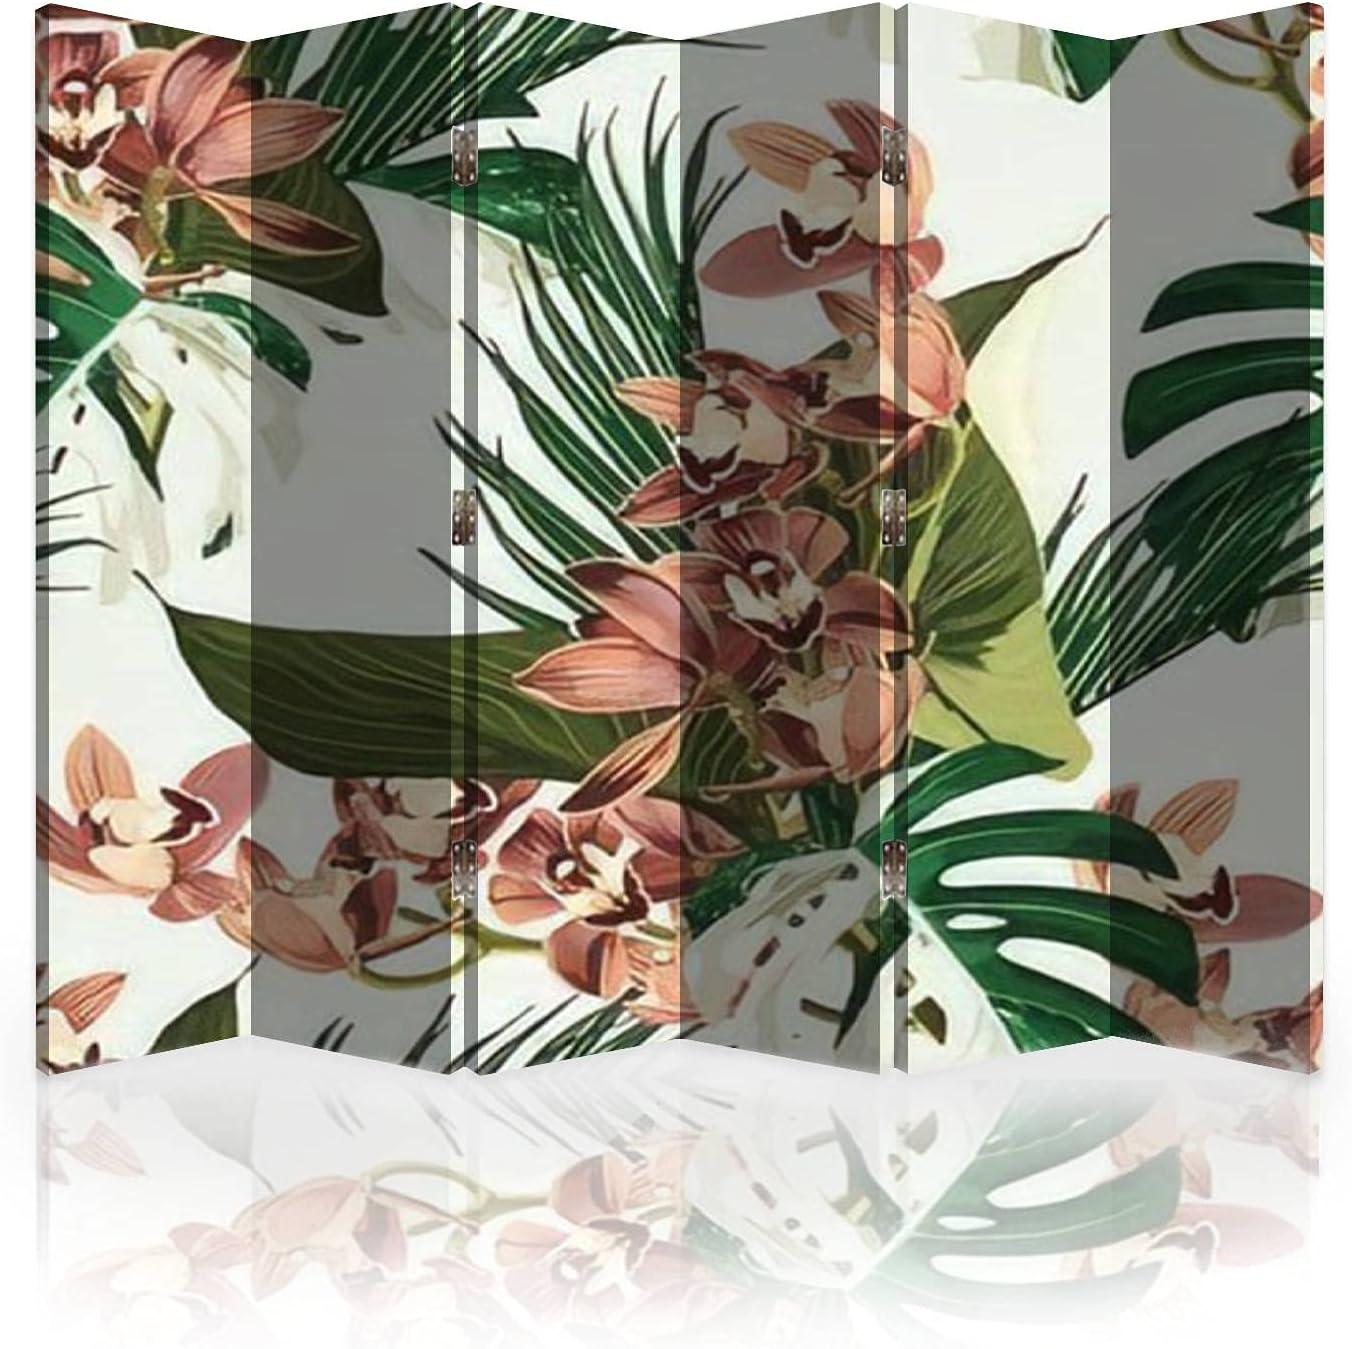 Canvas Room Divider Ranking TOP11 Screen Tropical Arlington Mall Beautiful Pat Flowers Pretty